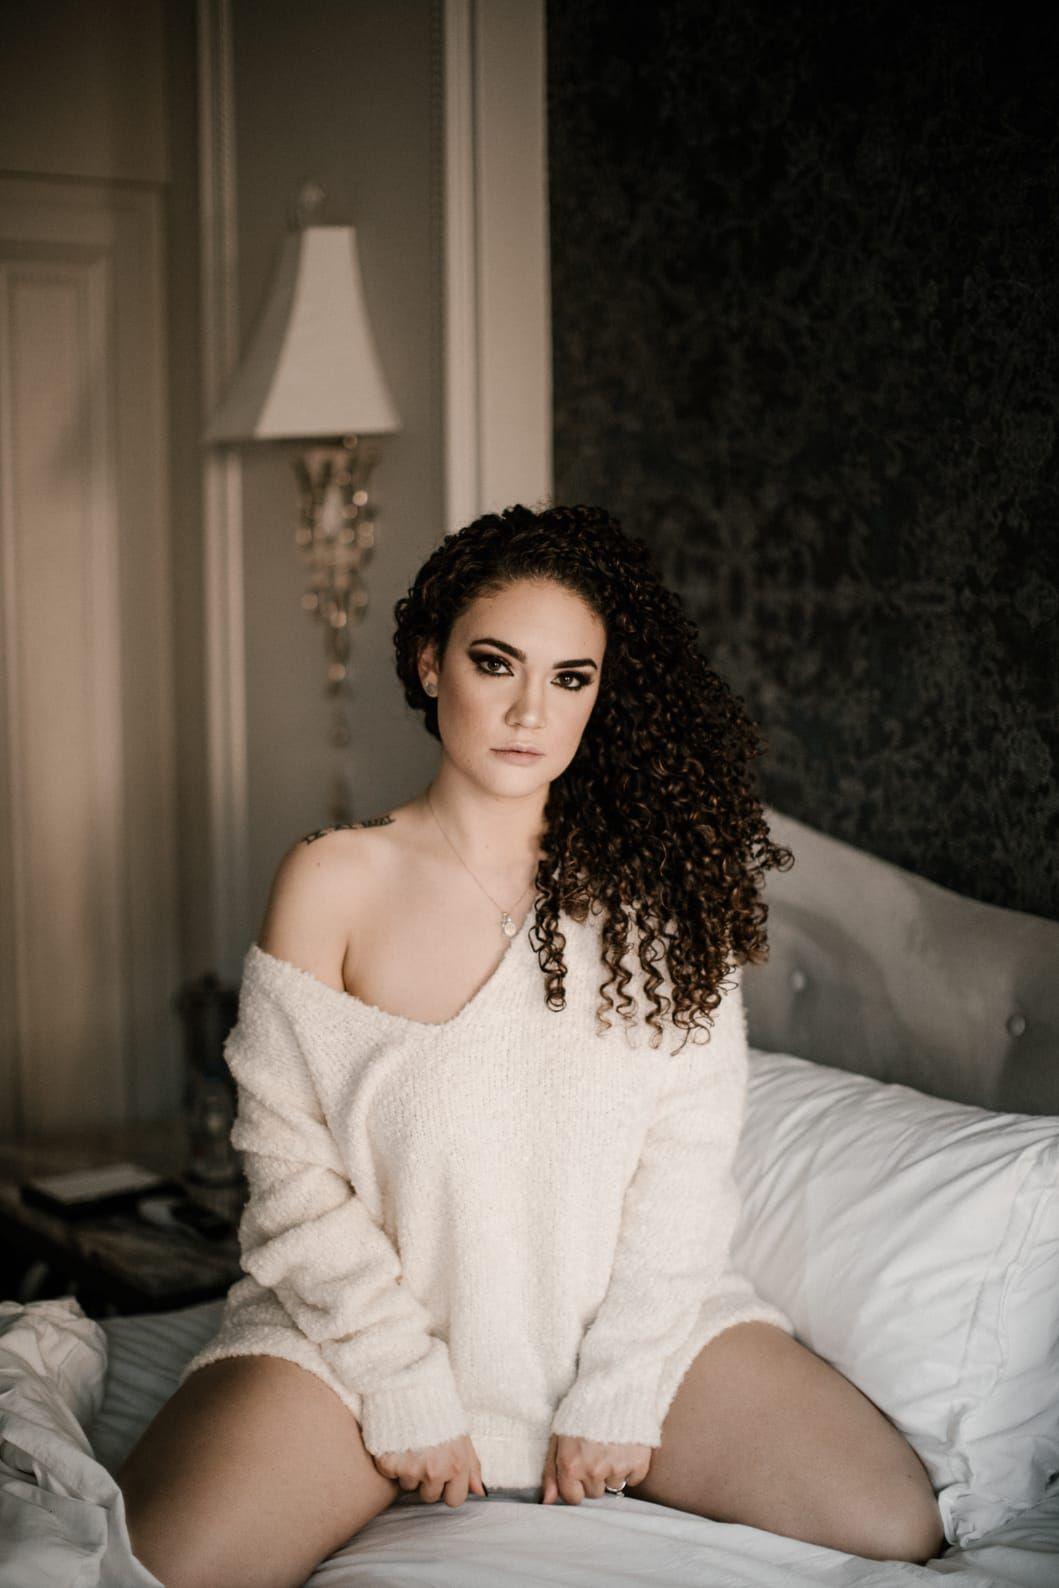 Boudoir shoot inspiration in 2020 boudoir photo shoot